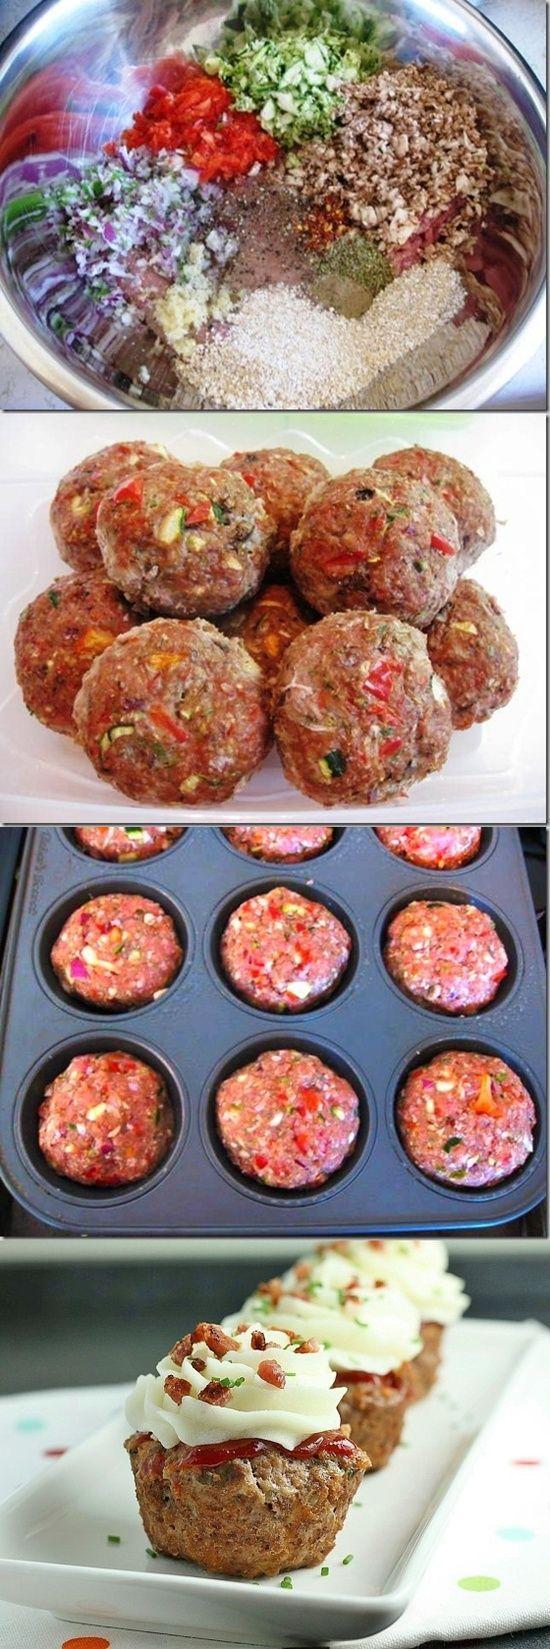 pastelitos de carne